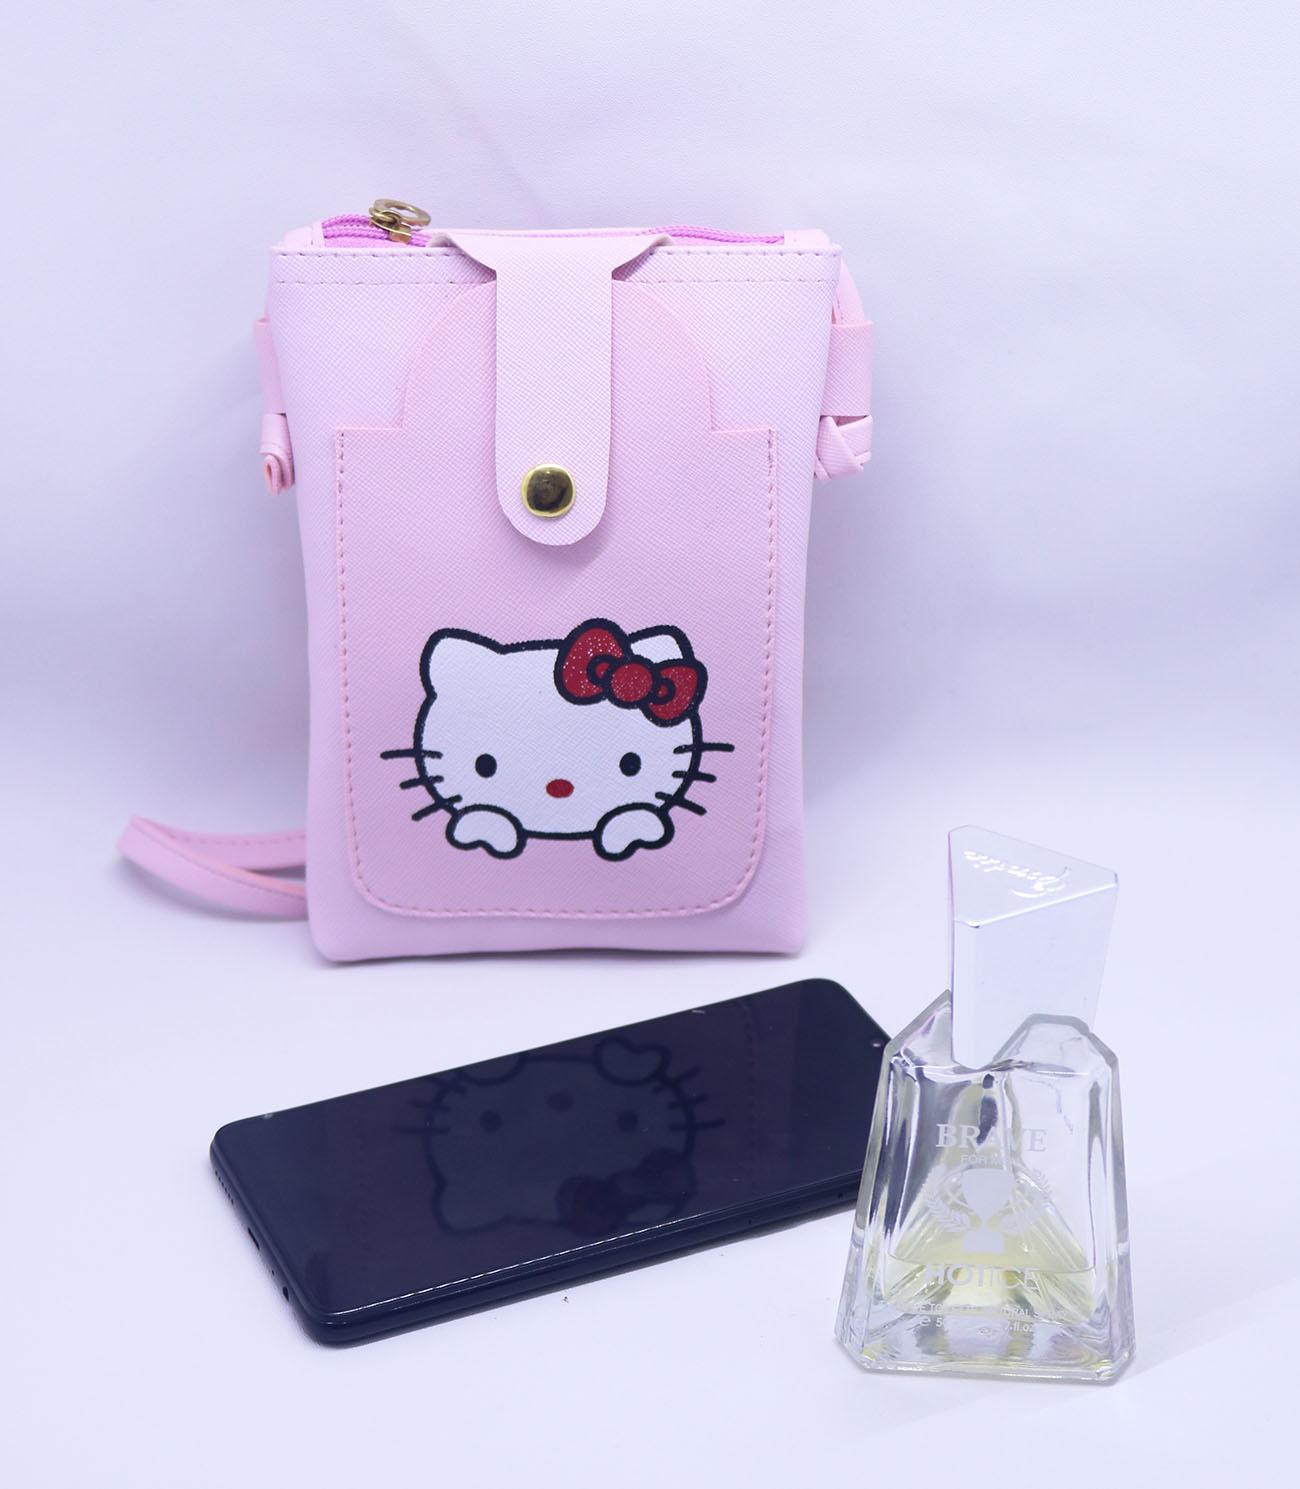 Yabeshop Tas Wanita Woman selempang Fashion Hello Kitty